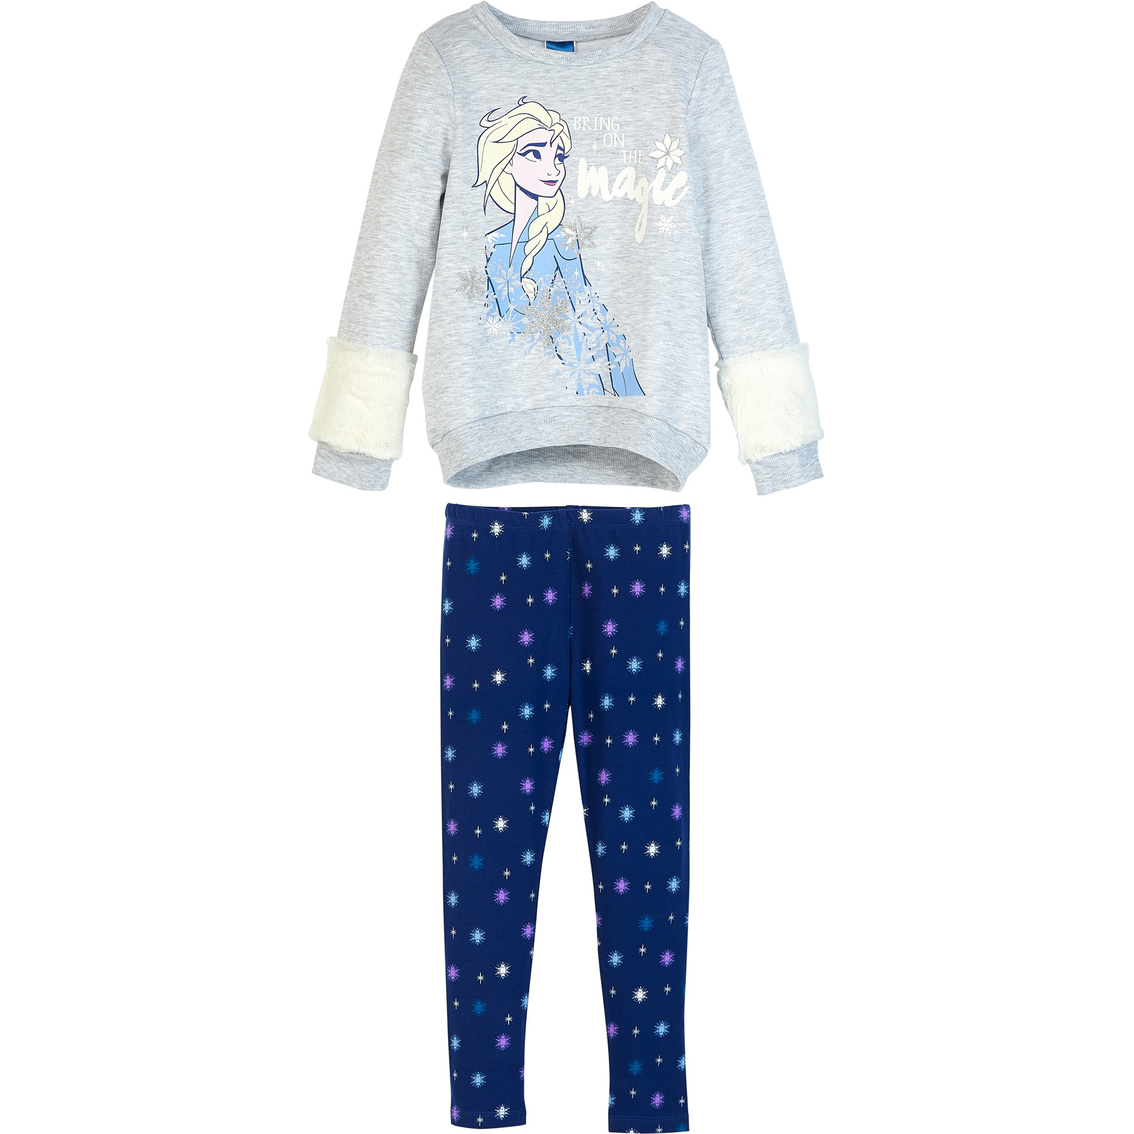 Disney Frozen Toddler Girls Long Sleeve Shirt /& Leggings Set